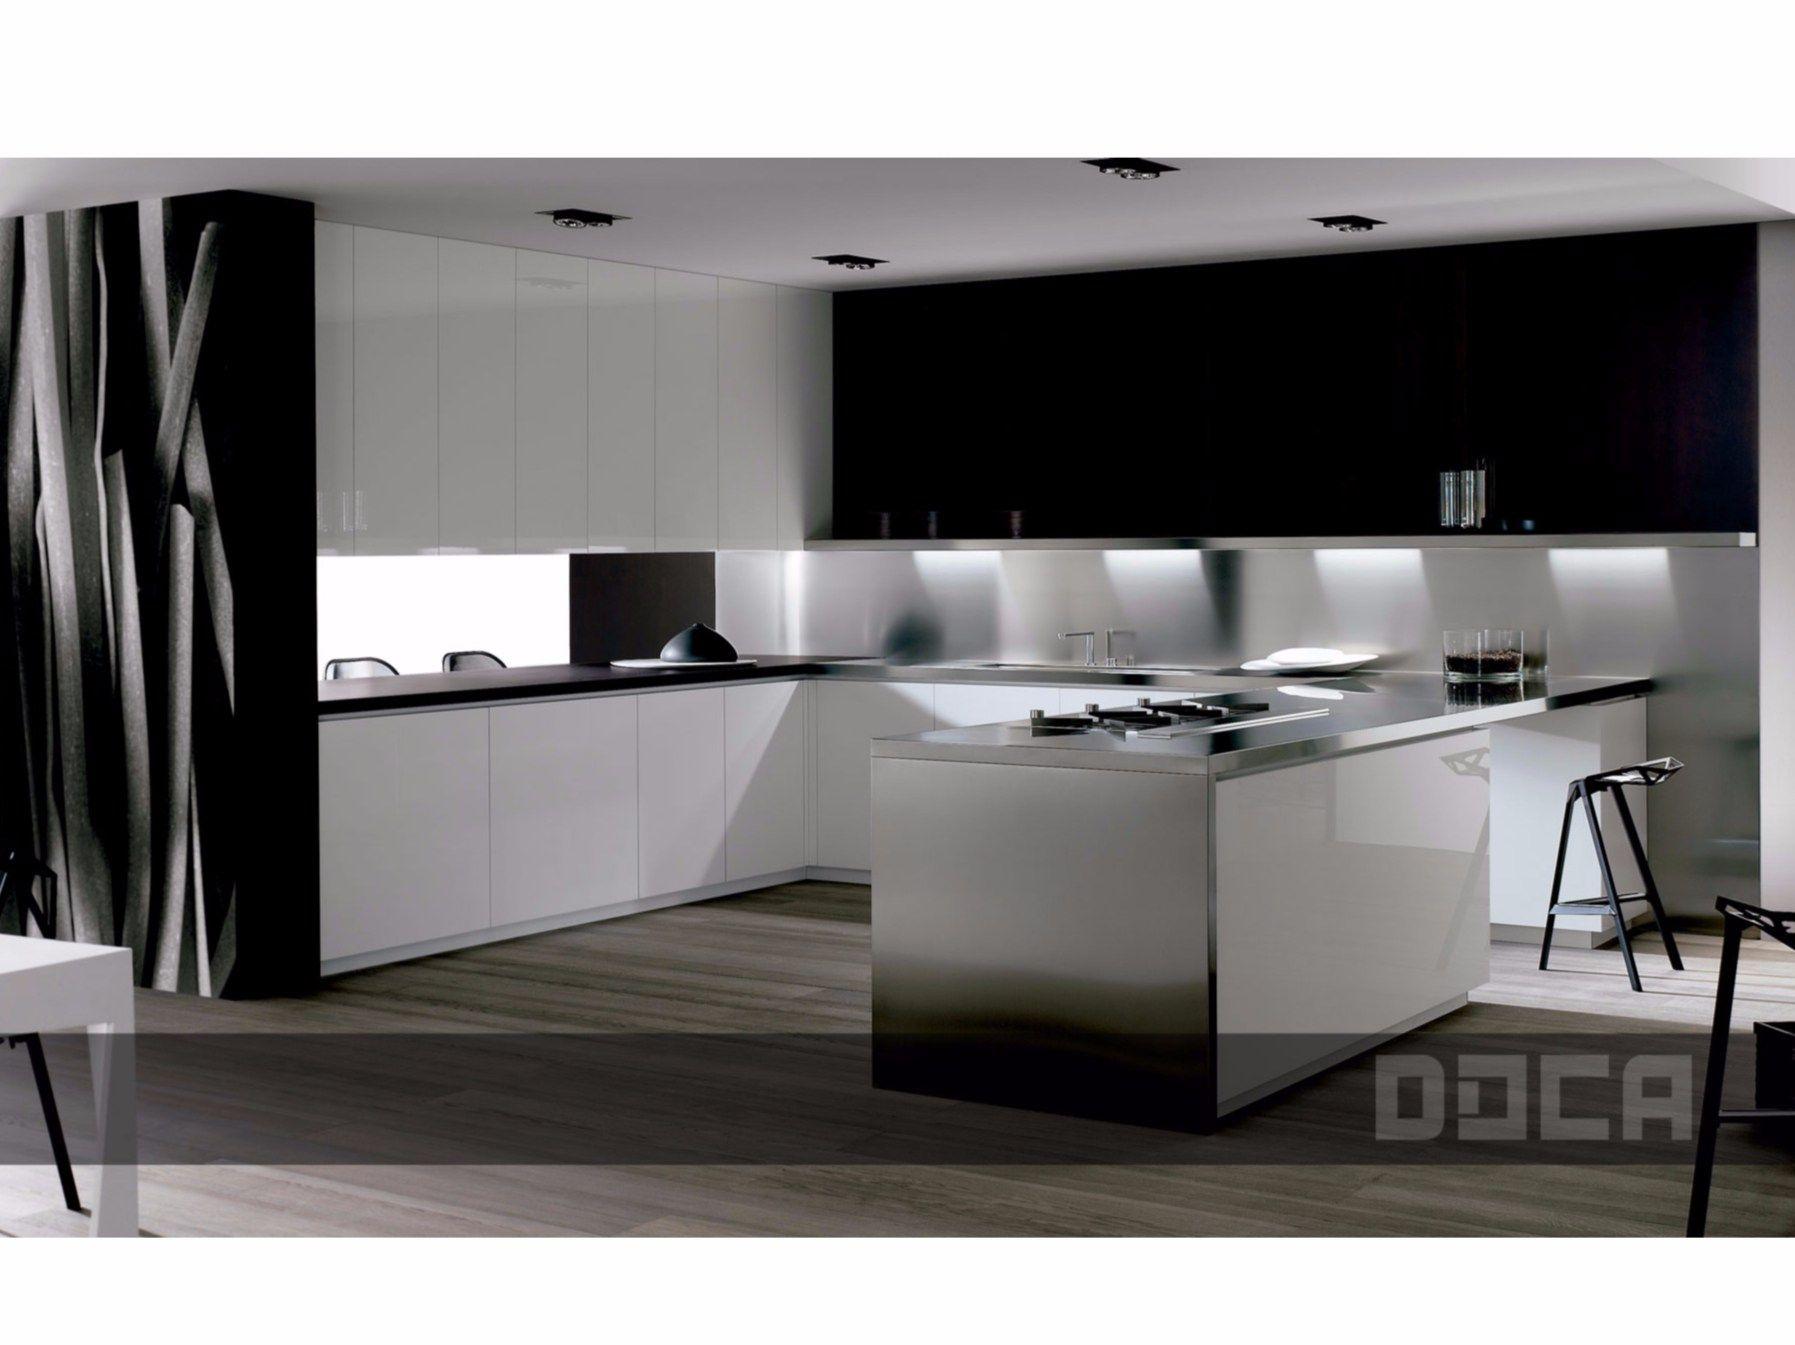 Muebles De Cocina Doca - Hogar Y Ideas De Diseño - Feirt.com